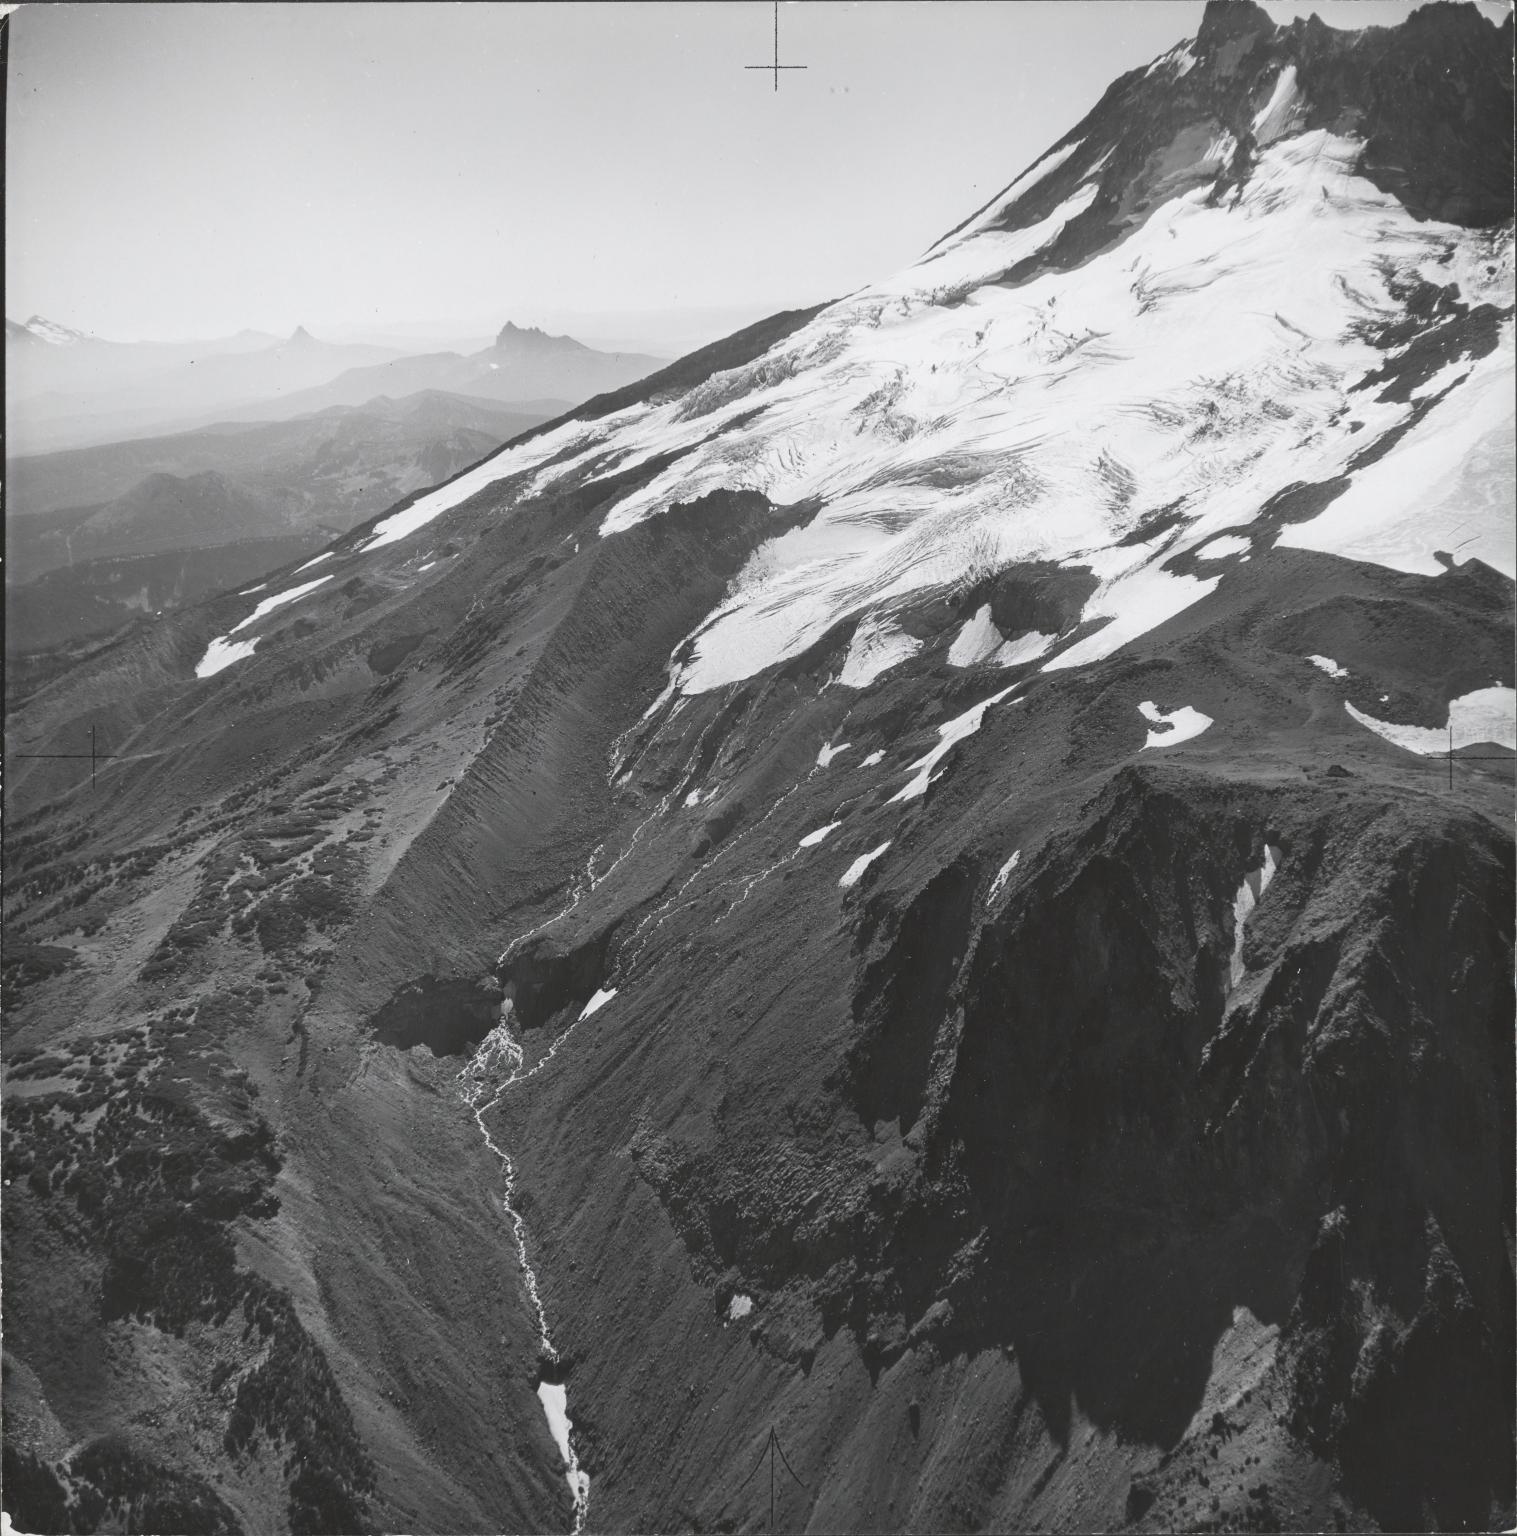 Whitewater Glacier, aerial photograph roll no. 21 exposure no. 39, Oregon